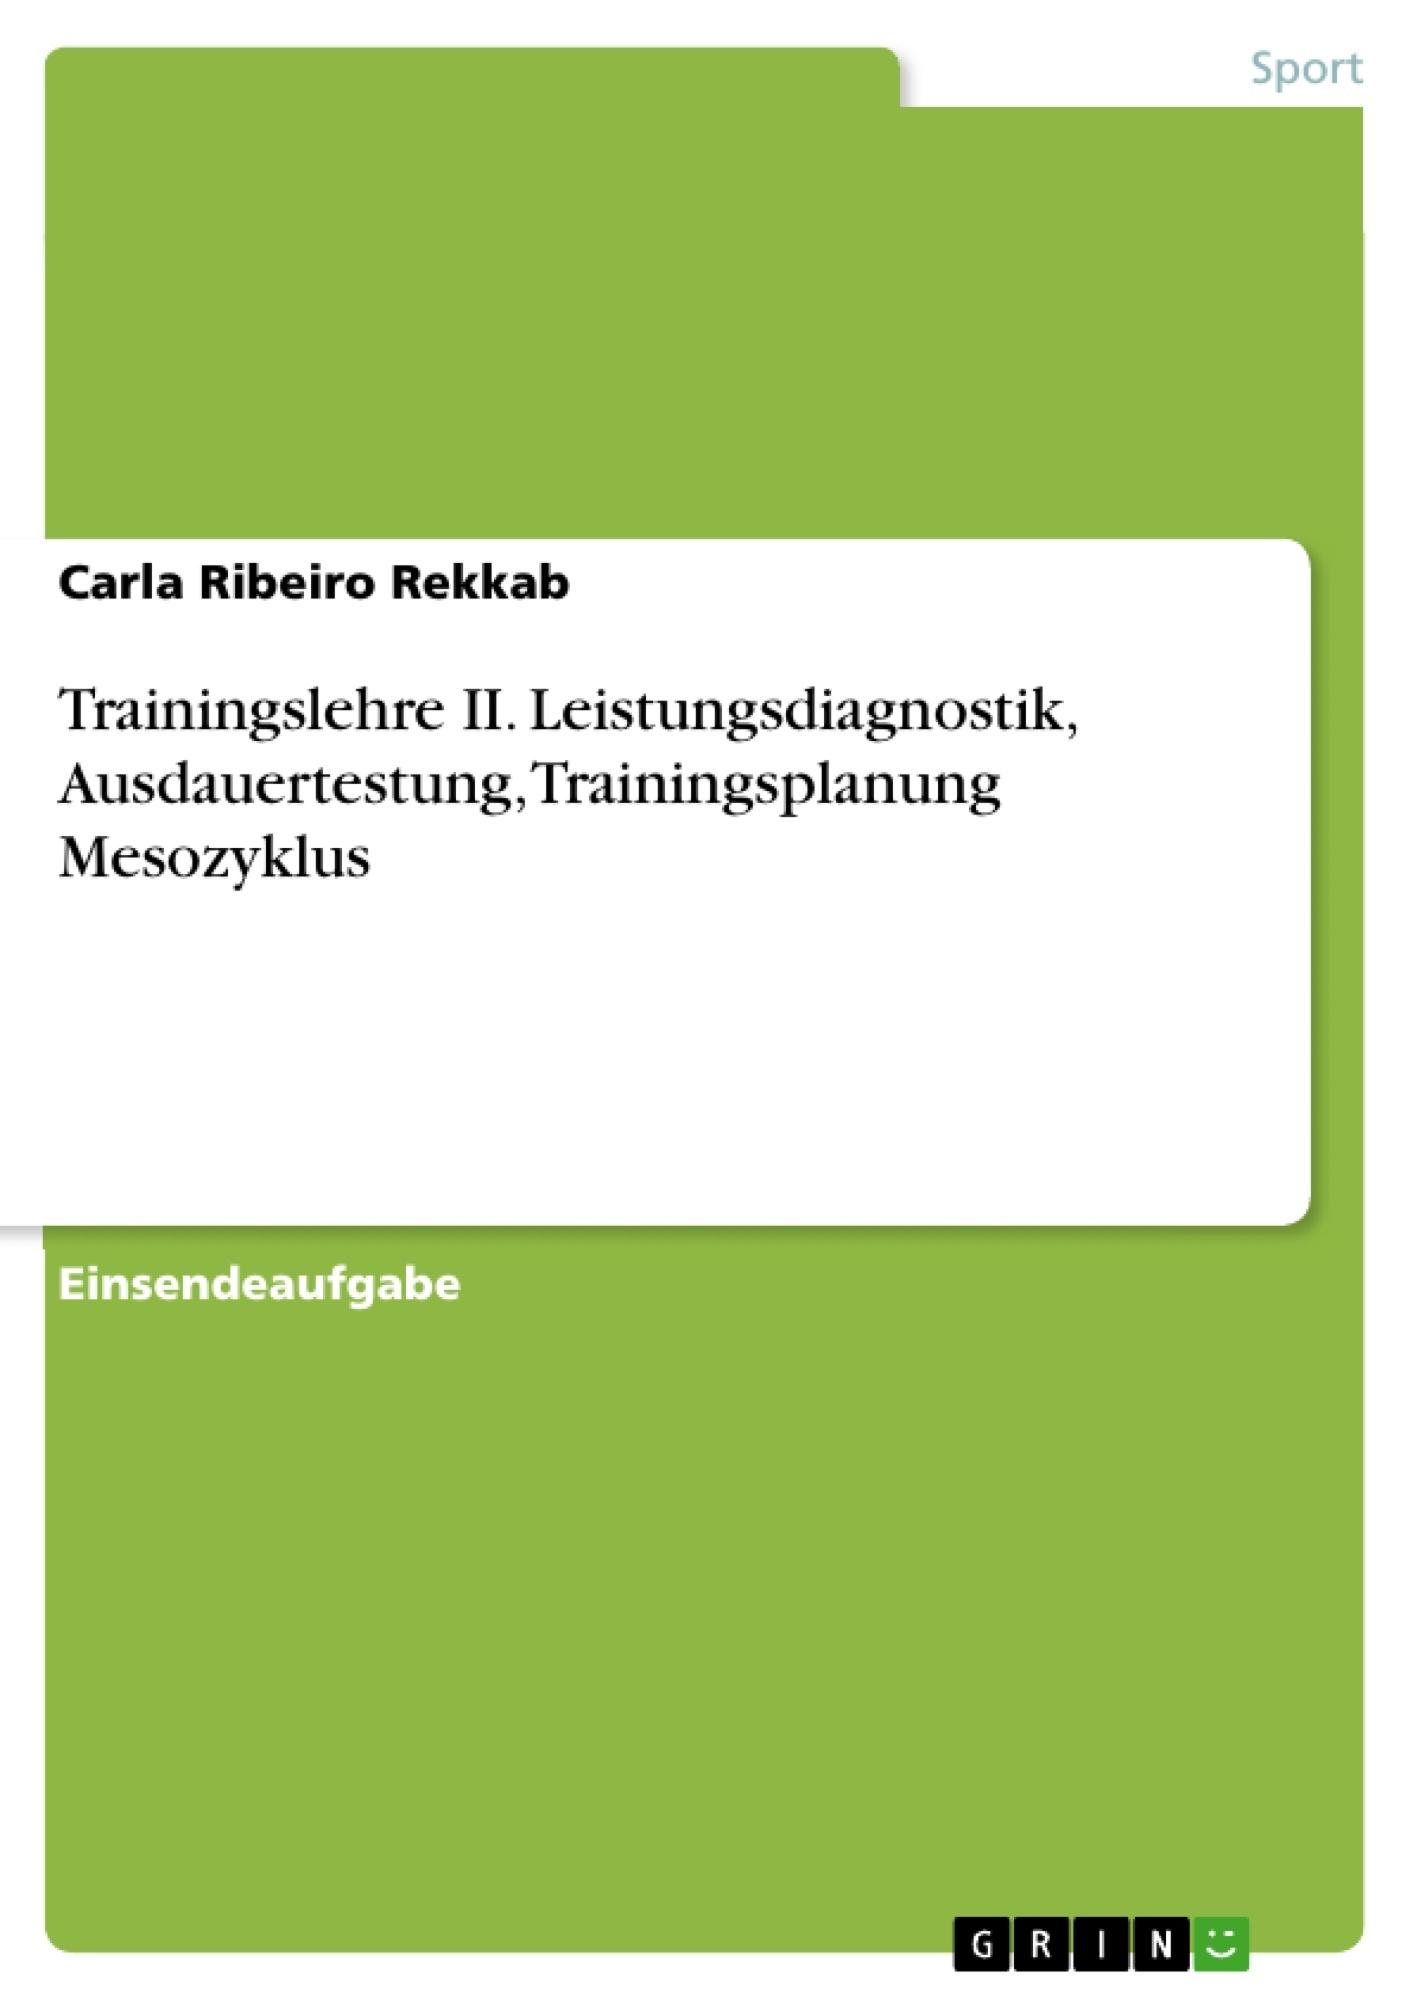 Titel: Trainingslehre II. Leistungsdiagnostik, Ausdauertestung, Trainingsplanung Mesozyklus